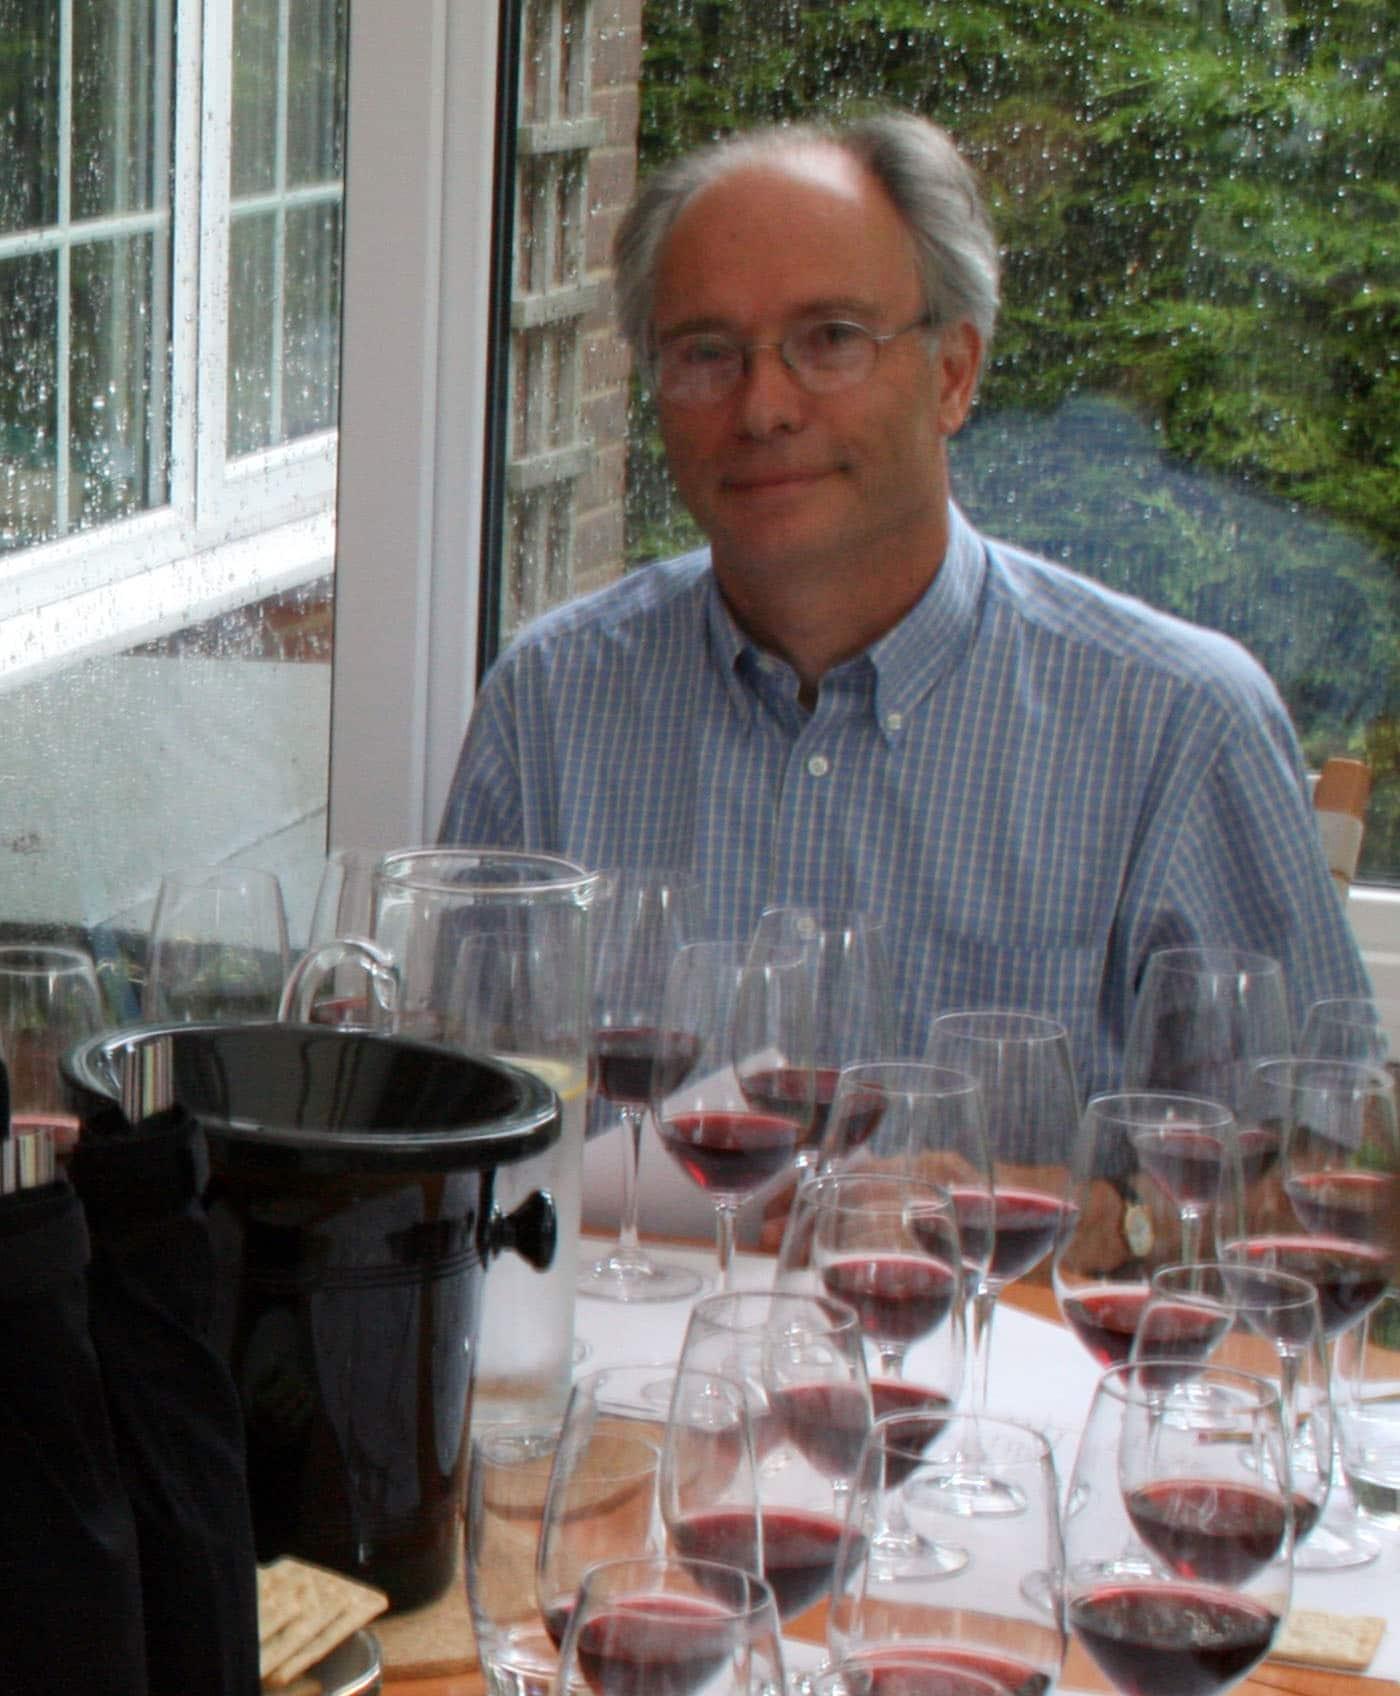 Burgundy villages 2004 tasting